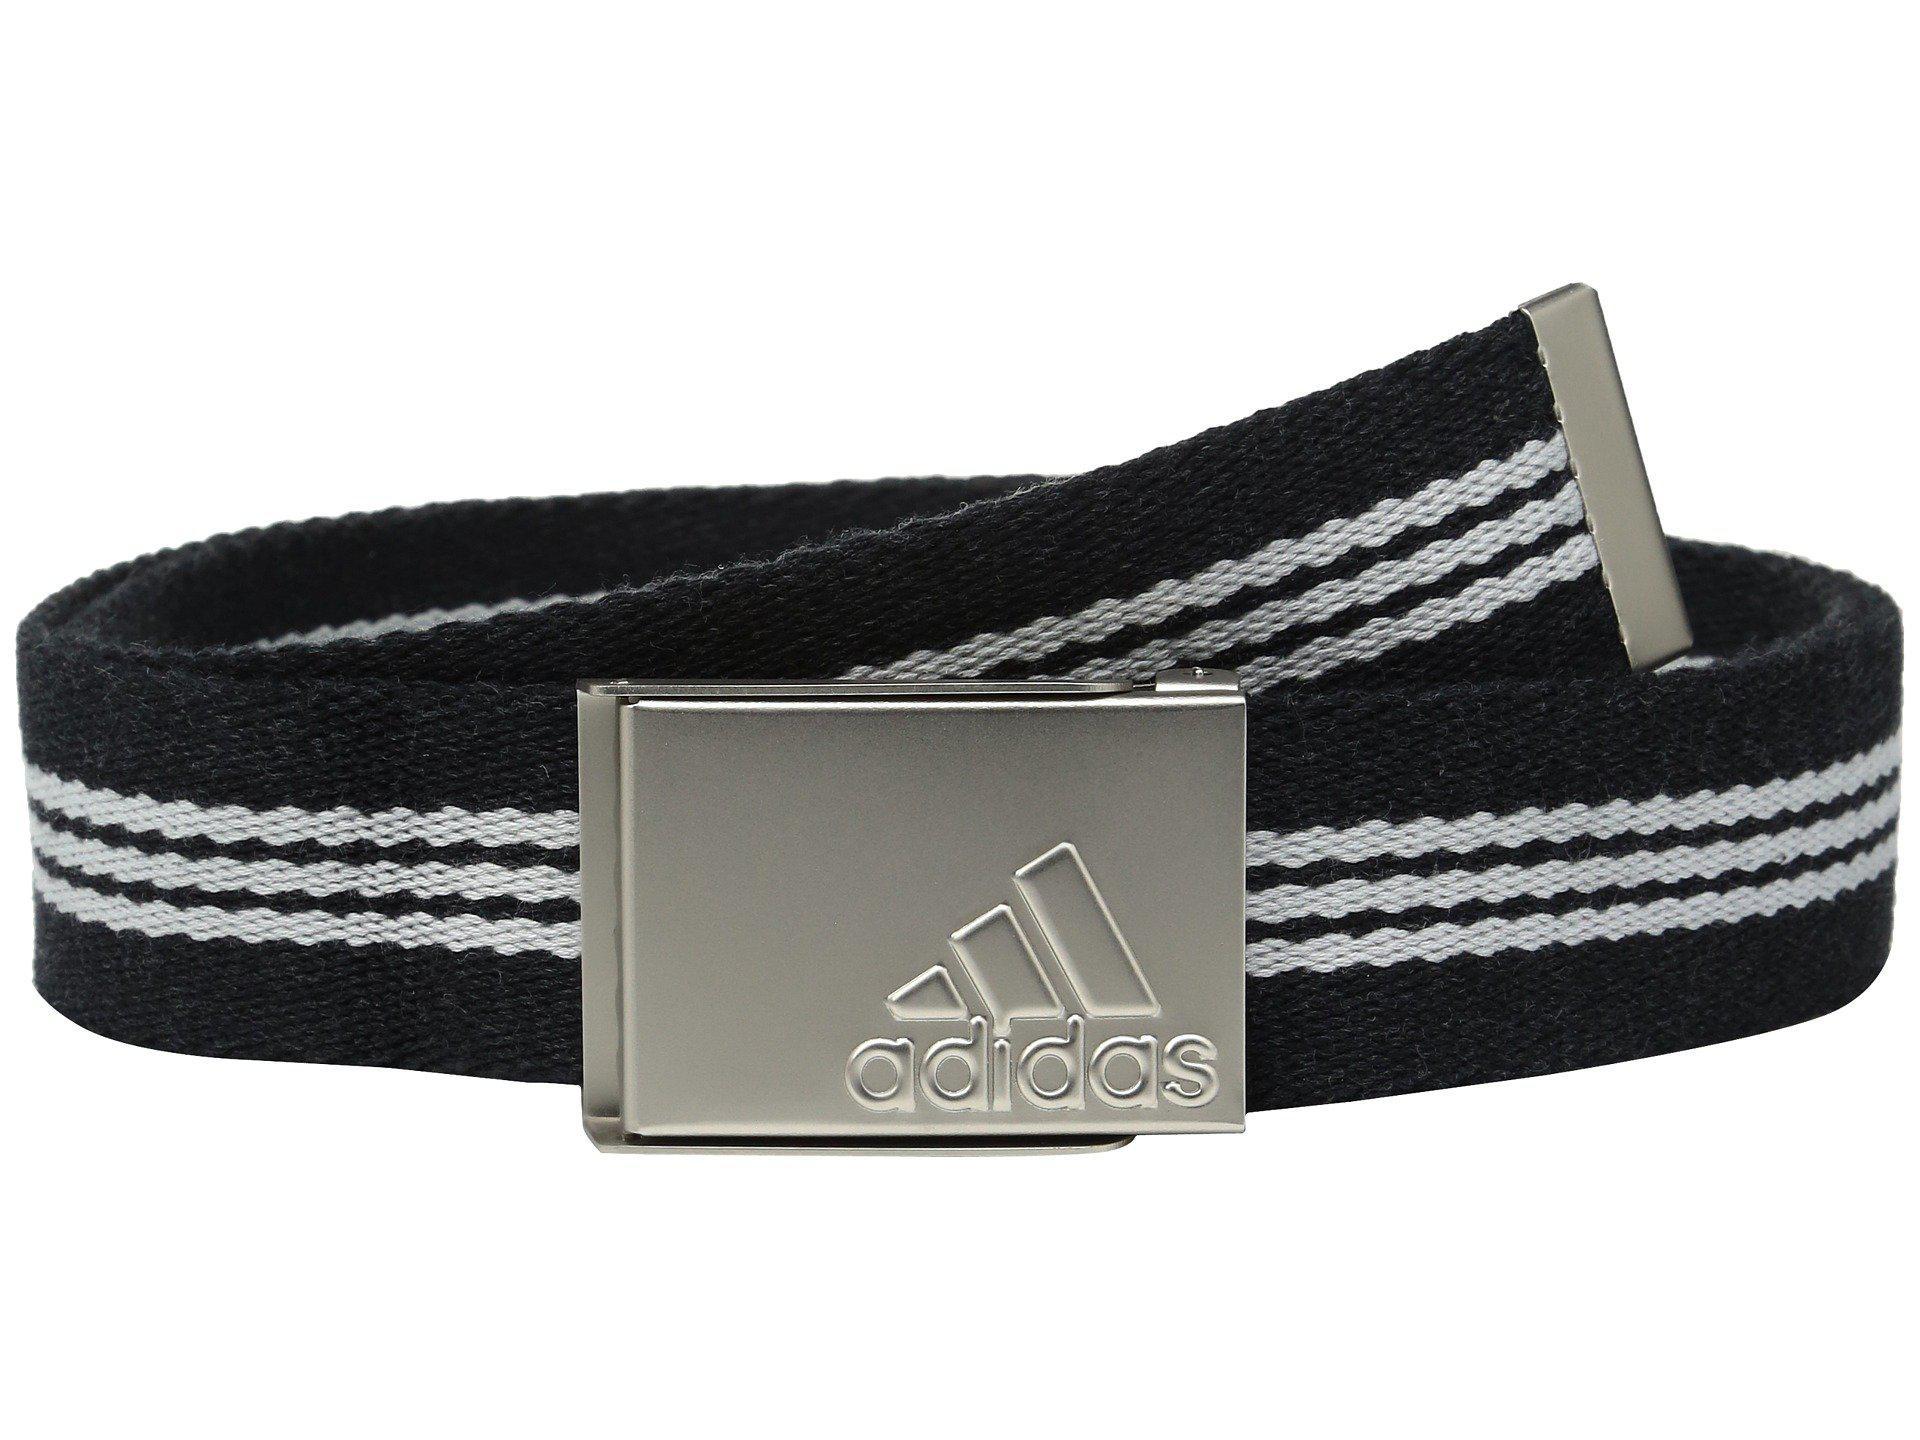 adidas originals belt